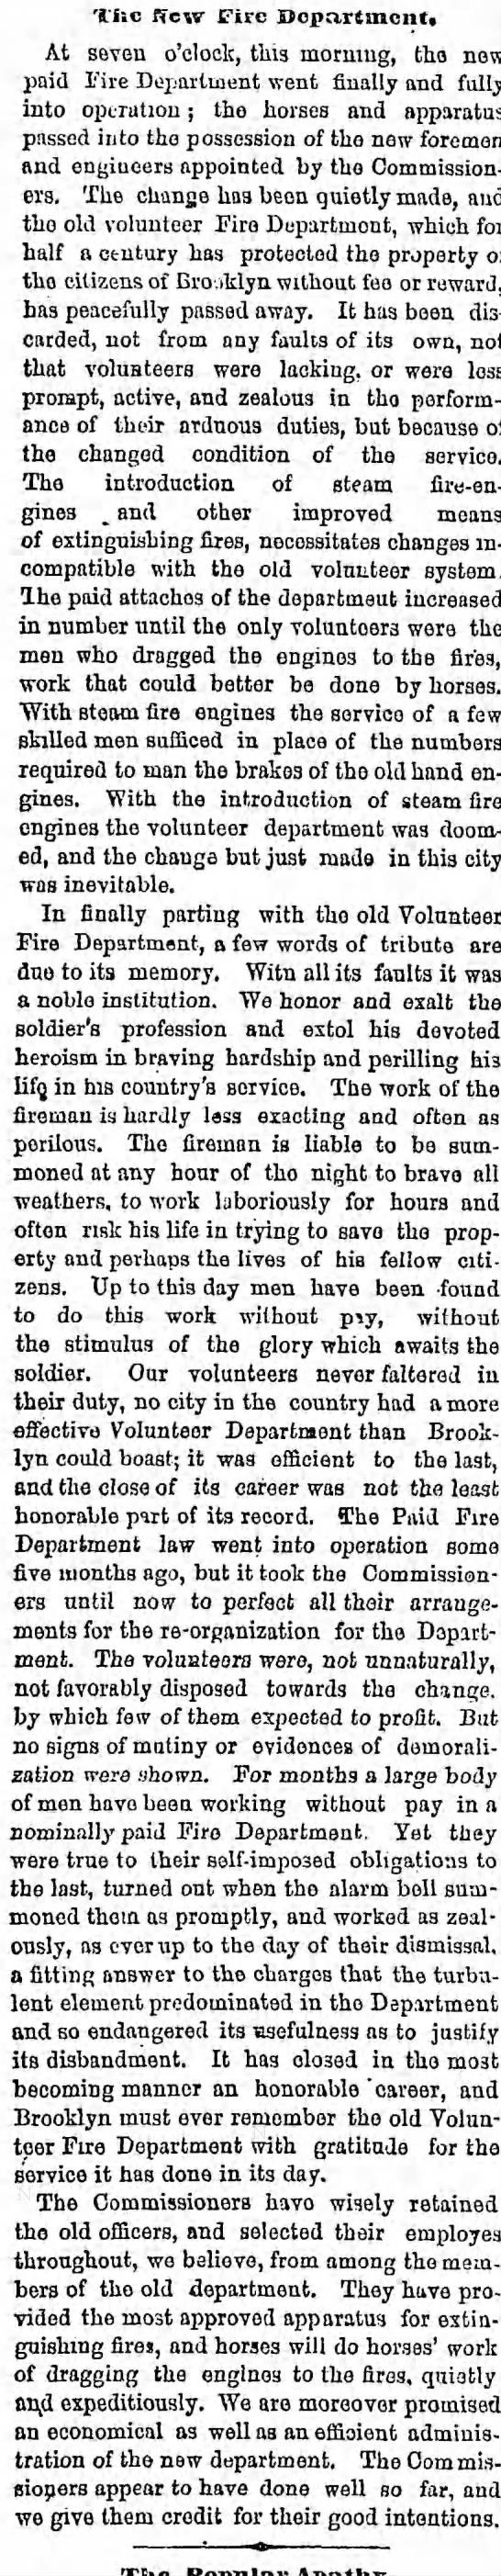 City of Brooklyn Fire Department September 1869 -